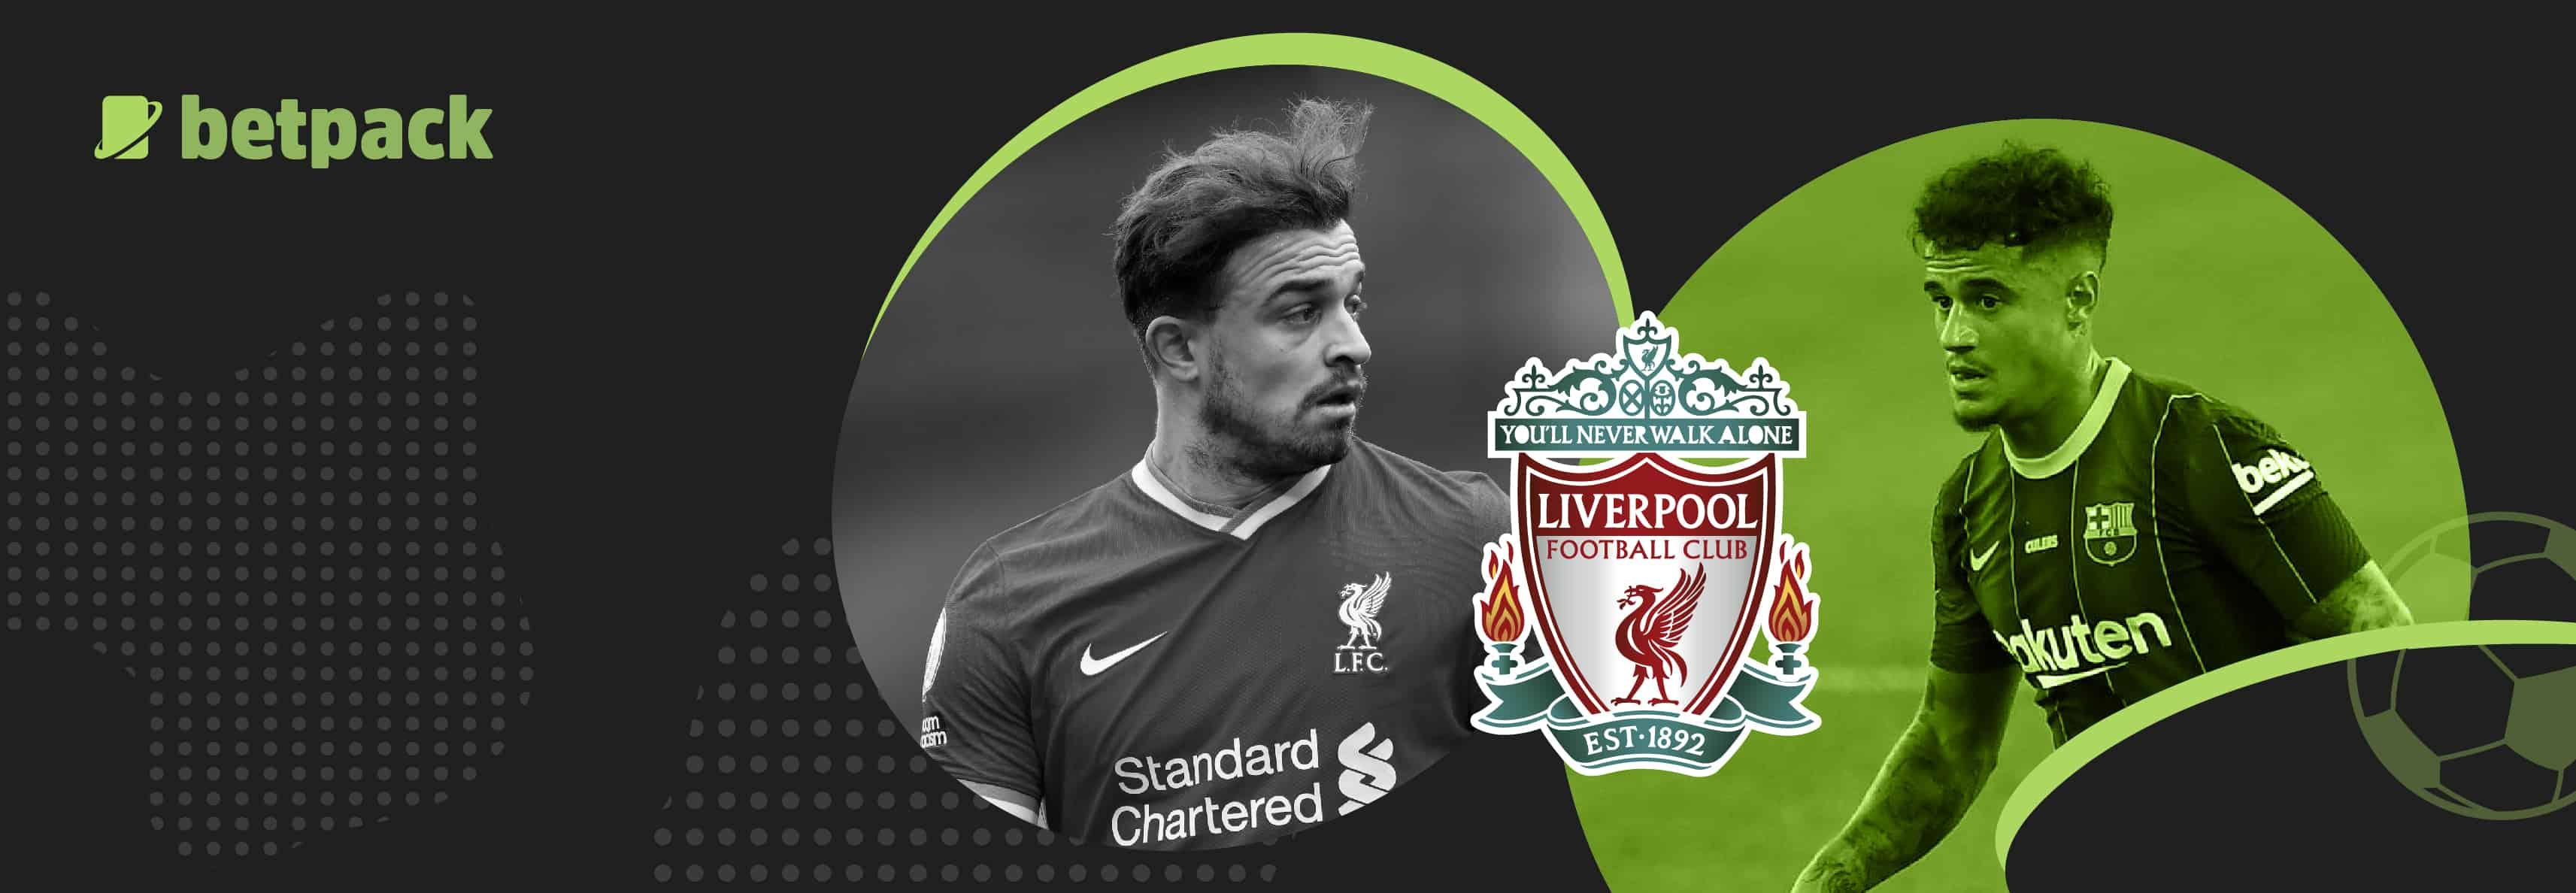 Liverpool eyeing Coutinho return as Shaqiri asks to leave